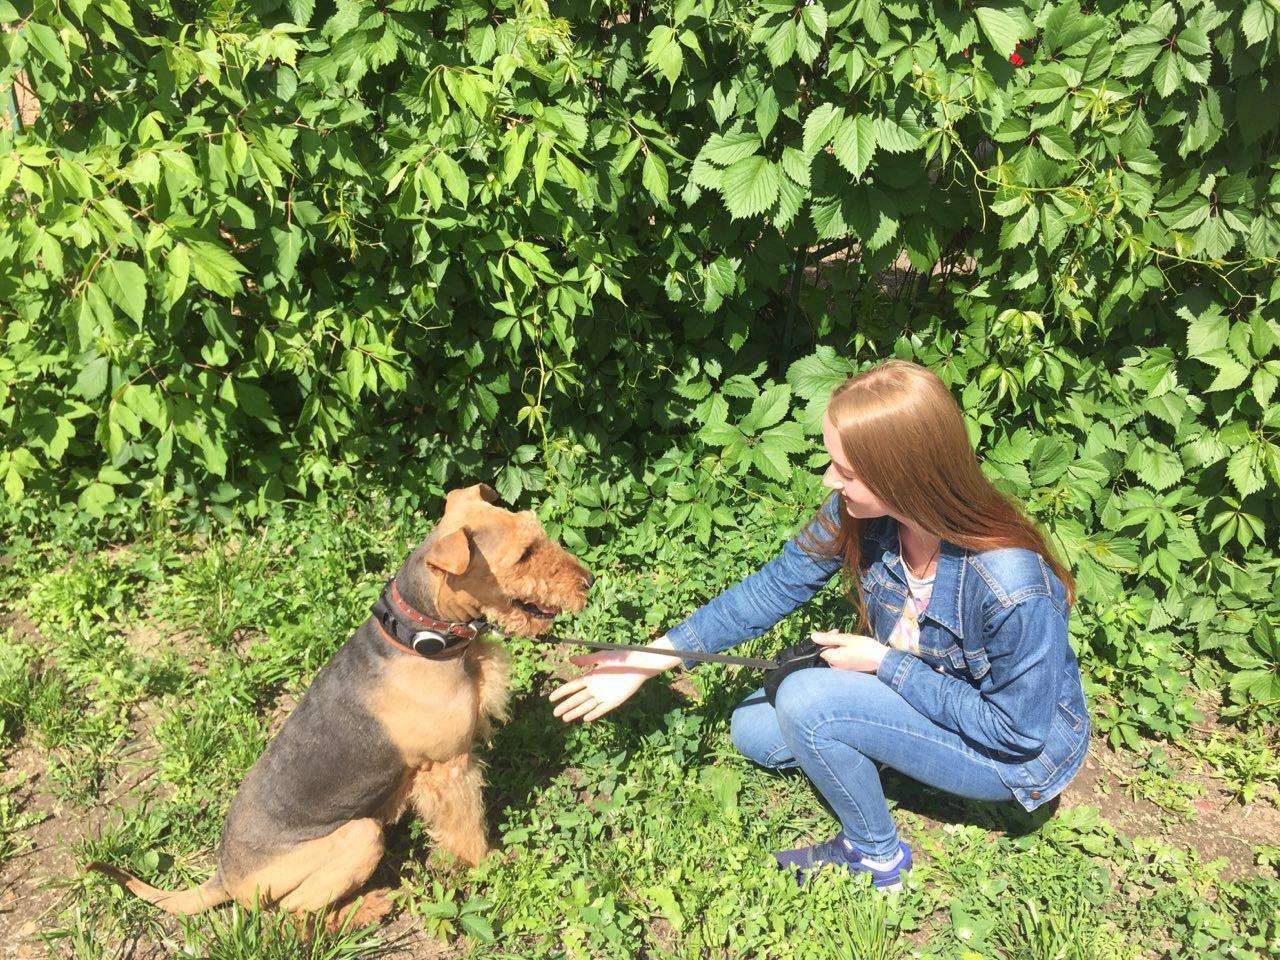 Как работает сервис по выгулу собак «Собака-гуляка» - 2